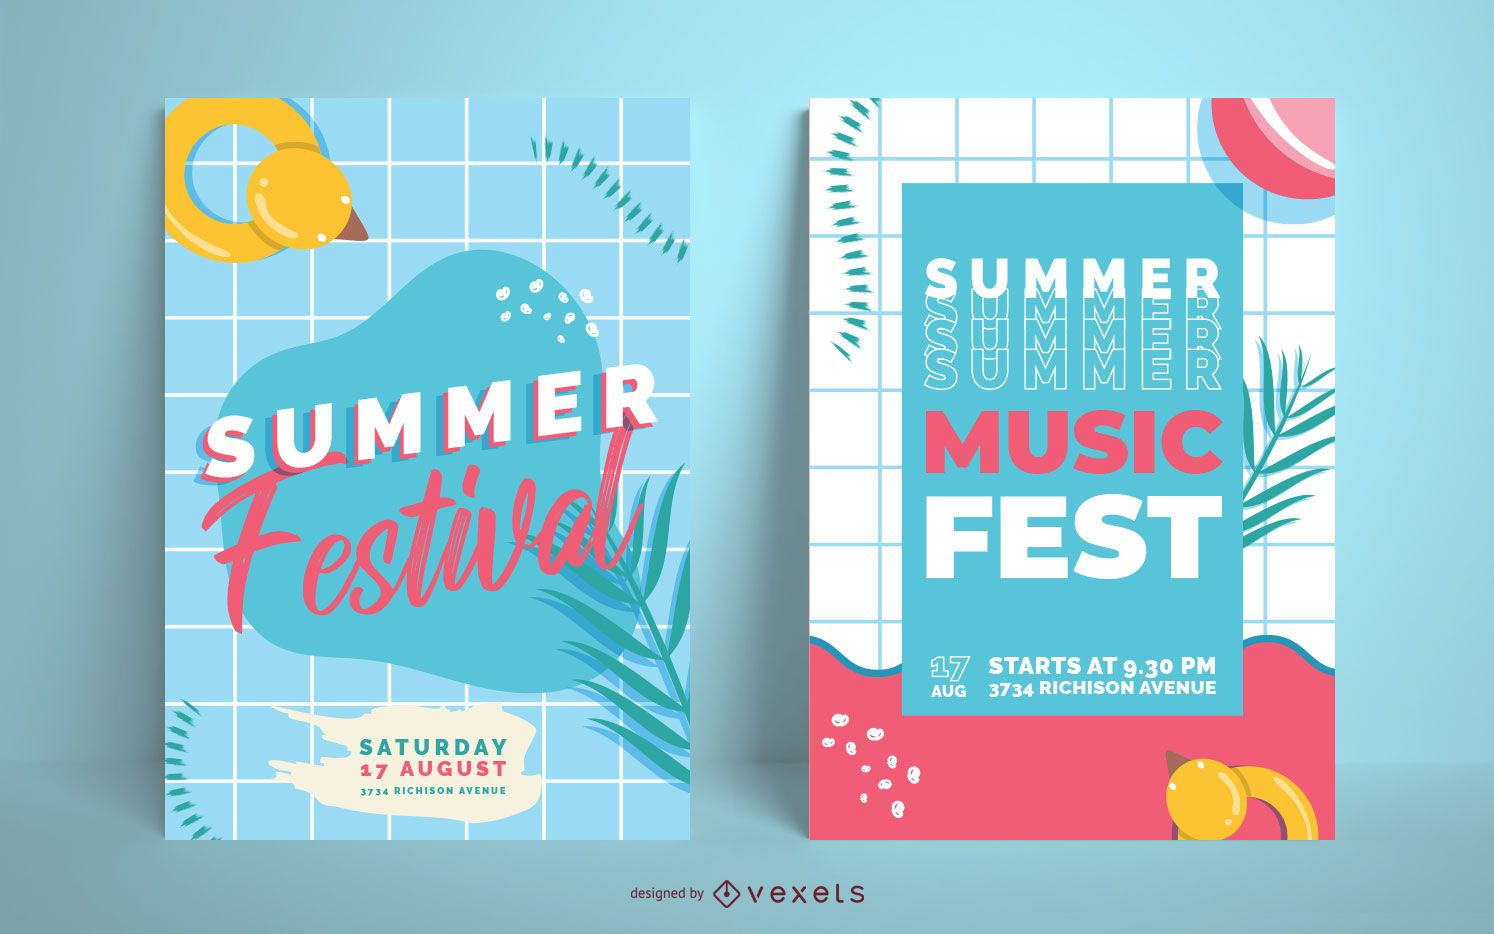 Summer Festival Party Poster Design